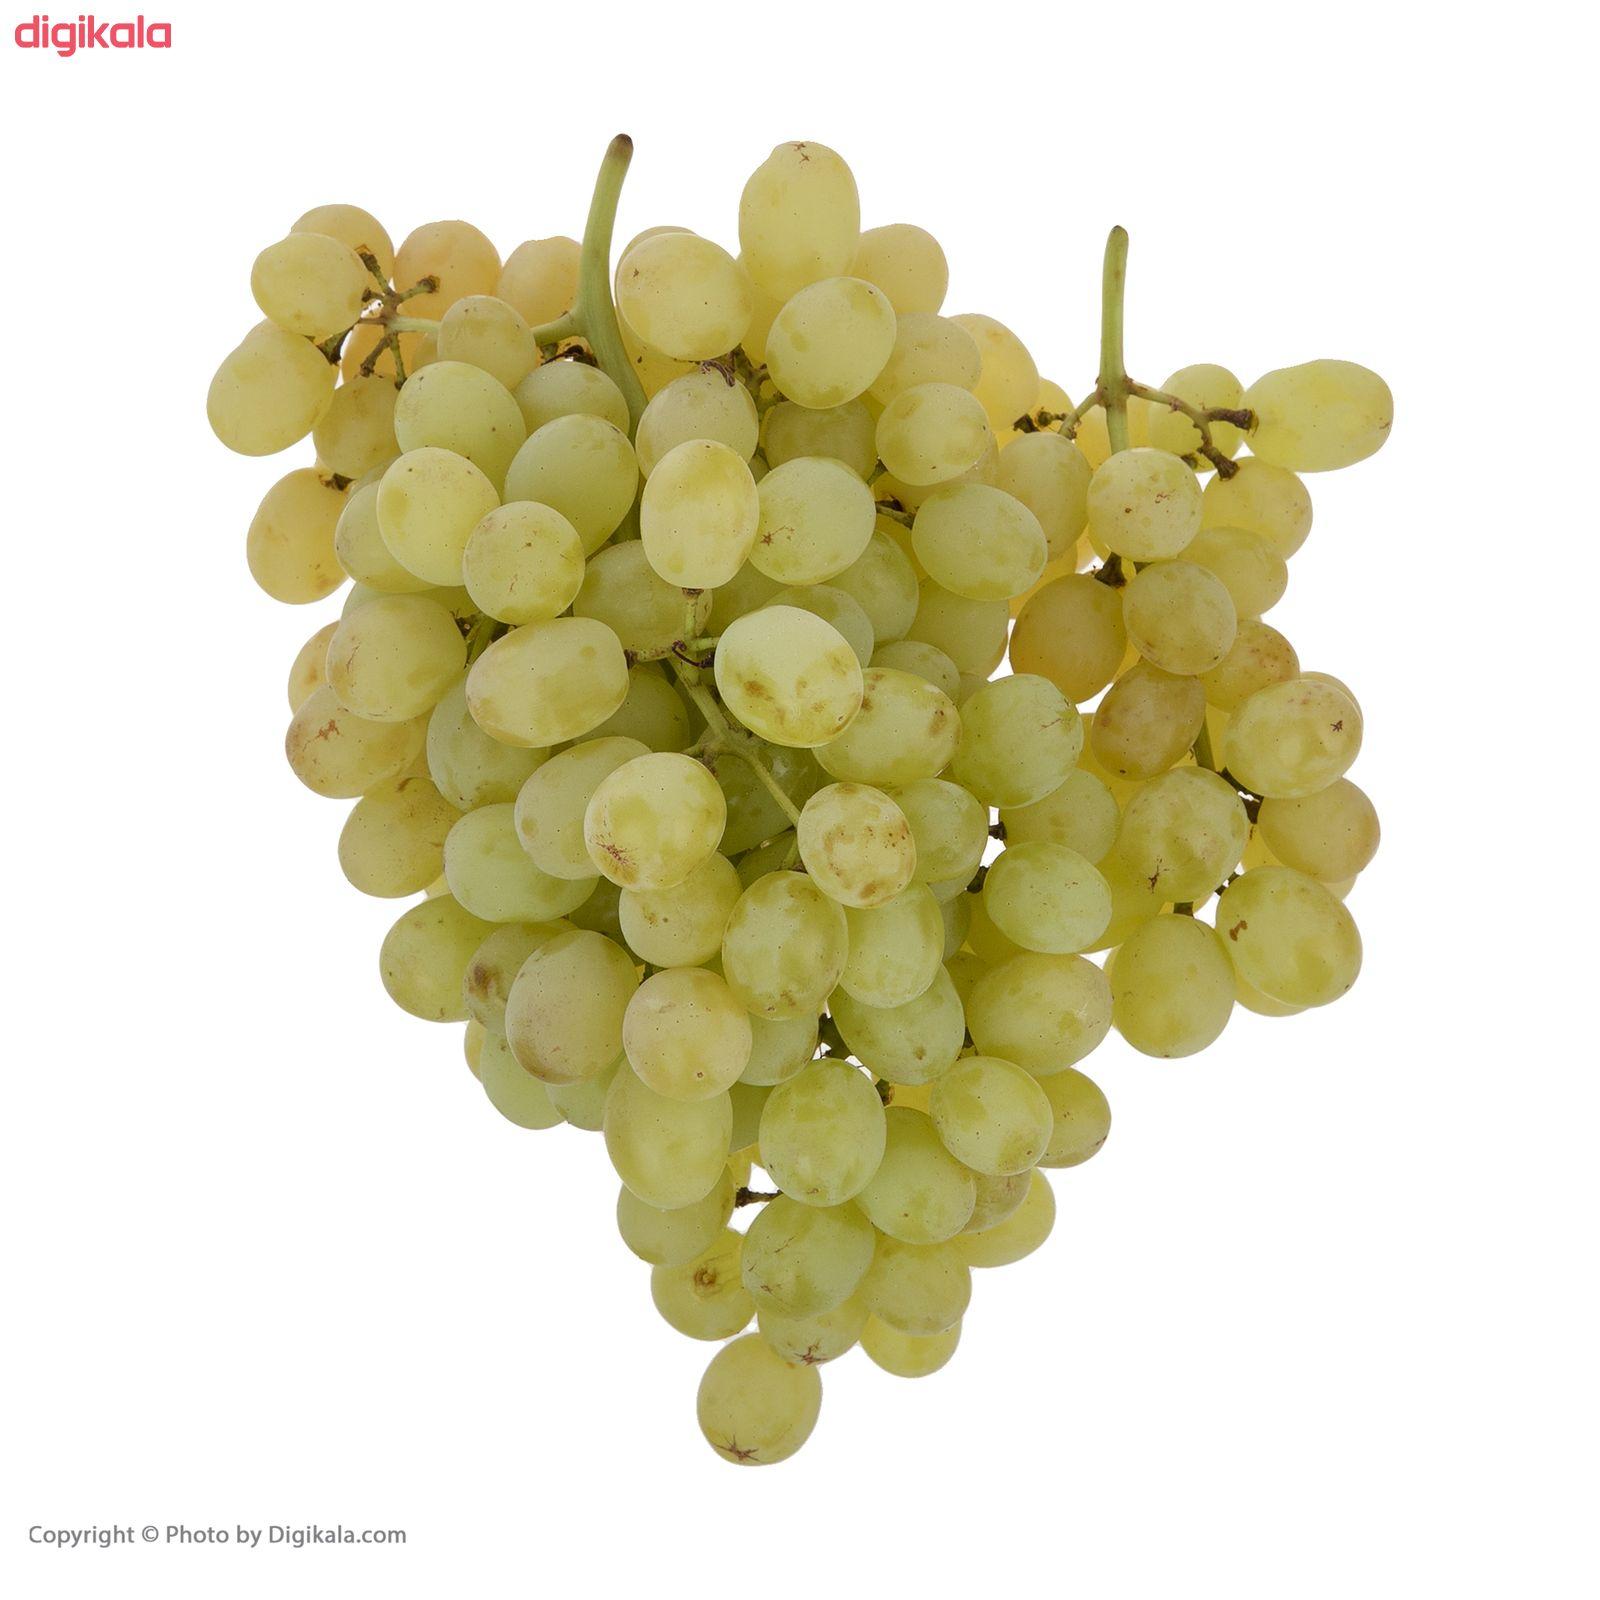 انگور بی دانه سفید بلوط - 500 گرم main 1 1